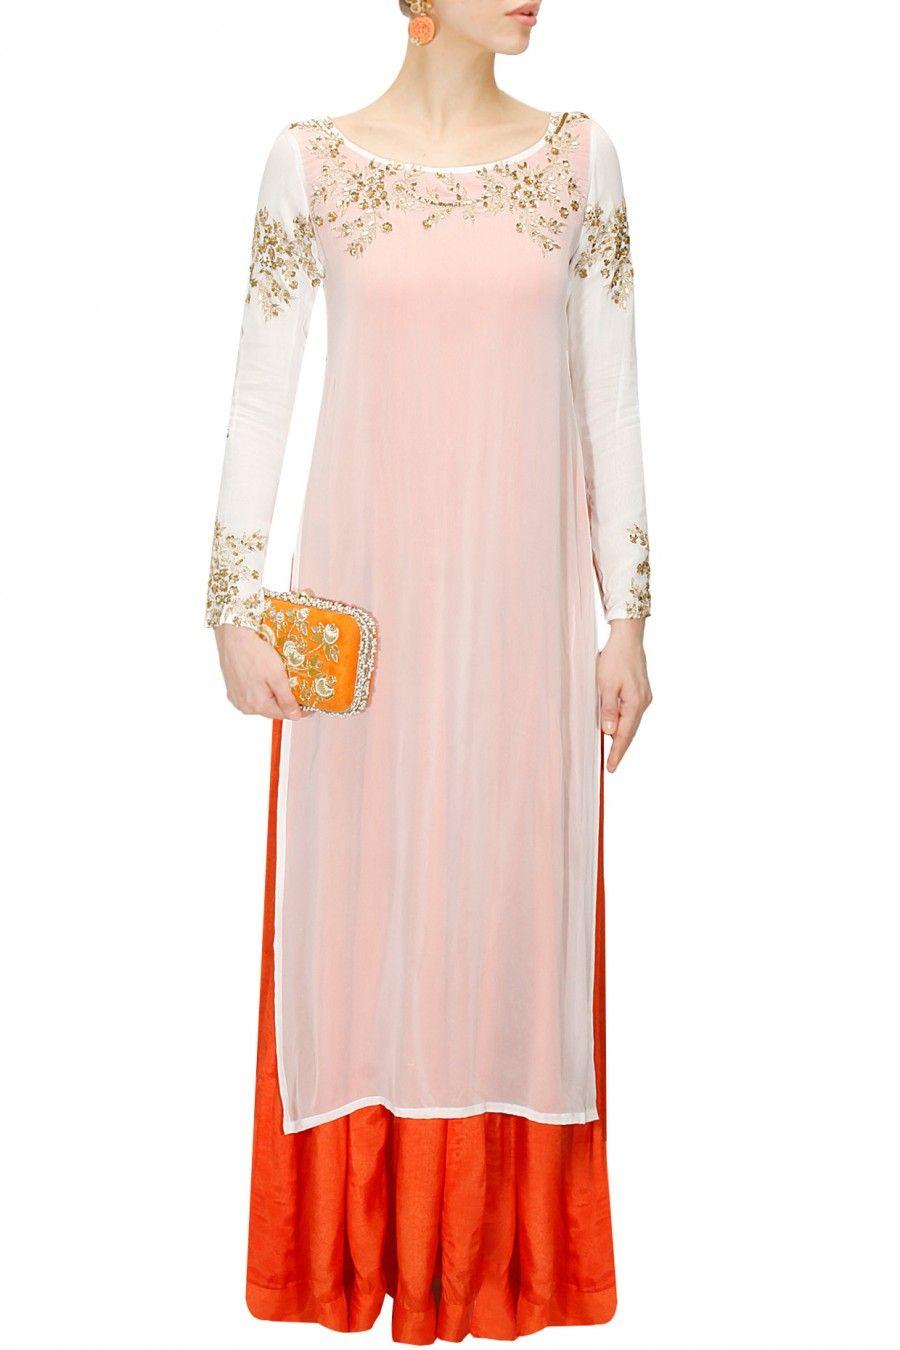 PRATHYUSHA GARIMELLA Orange plain anarkali with white gold ...